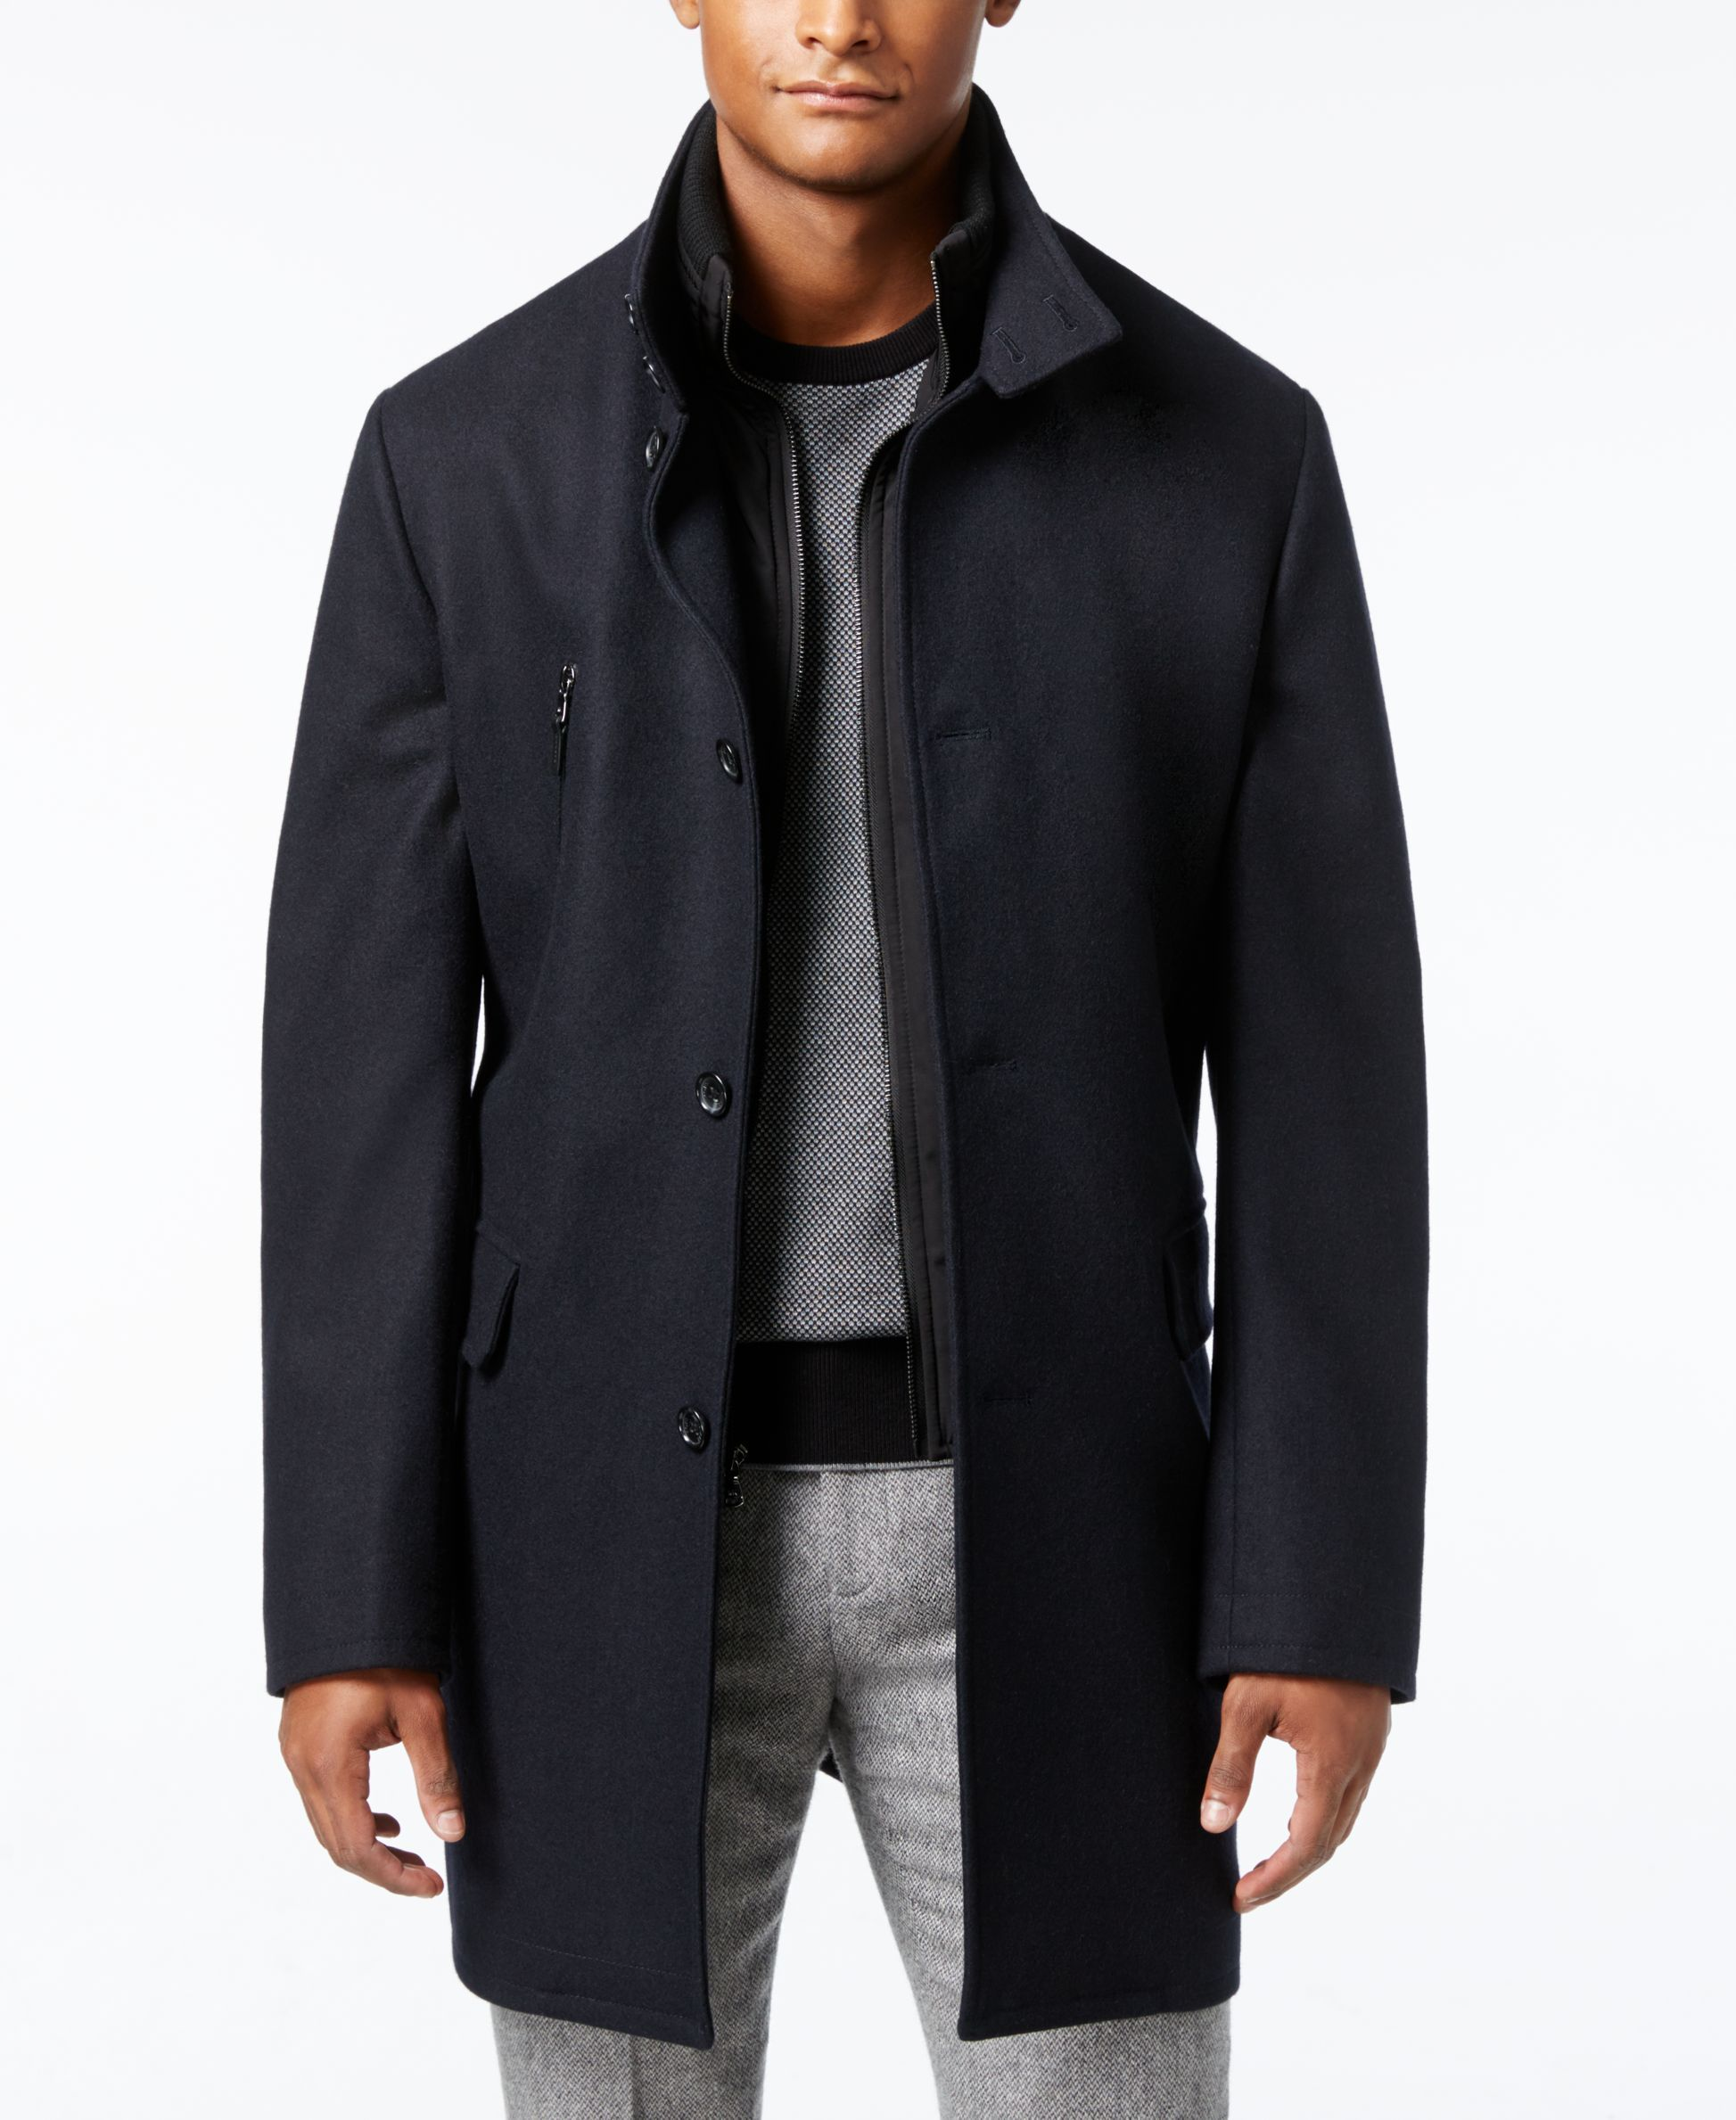 Michael Michael Kors Men S Water Resistant Bib Overcoat Overcoat Men Michael Kors Men Men S Coats And Jackets [ 2378 x 1947 Pixel ]